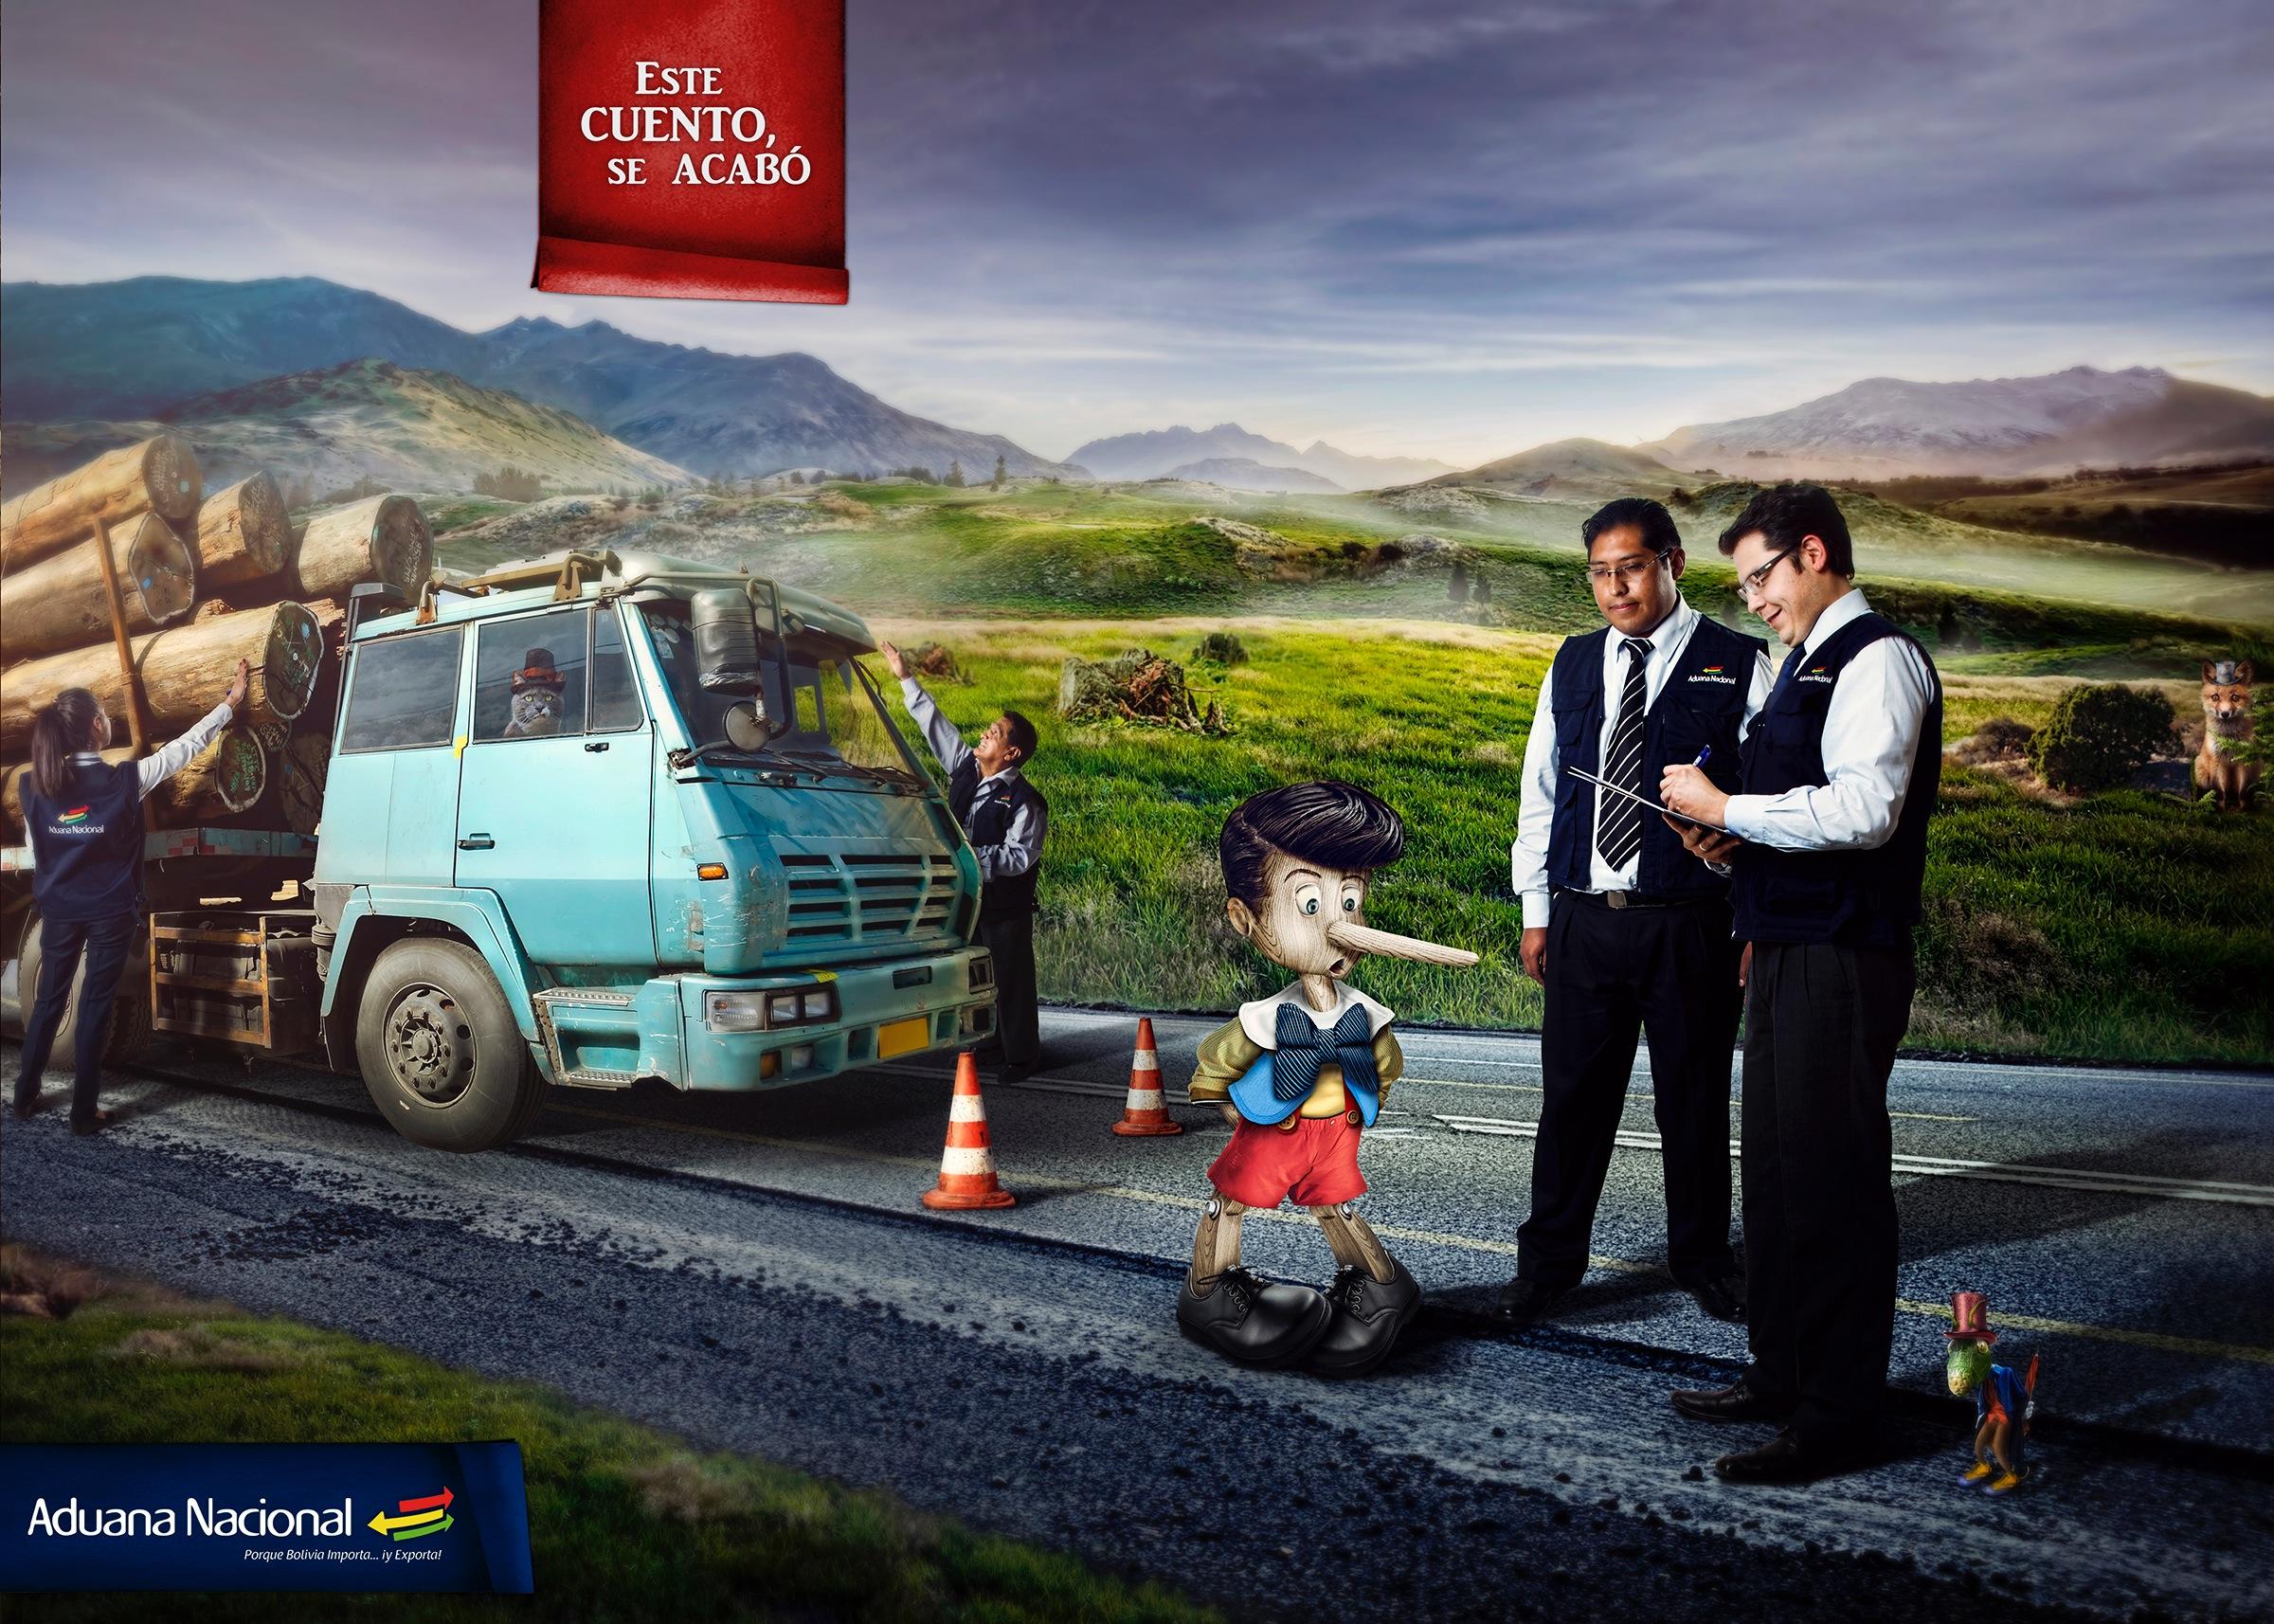 Aduana Nacional - ピノキオ